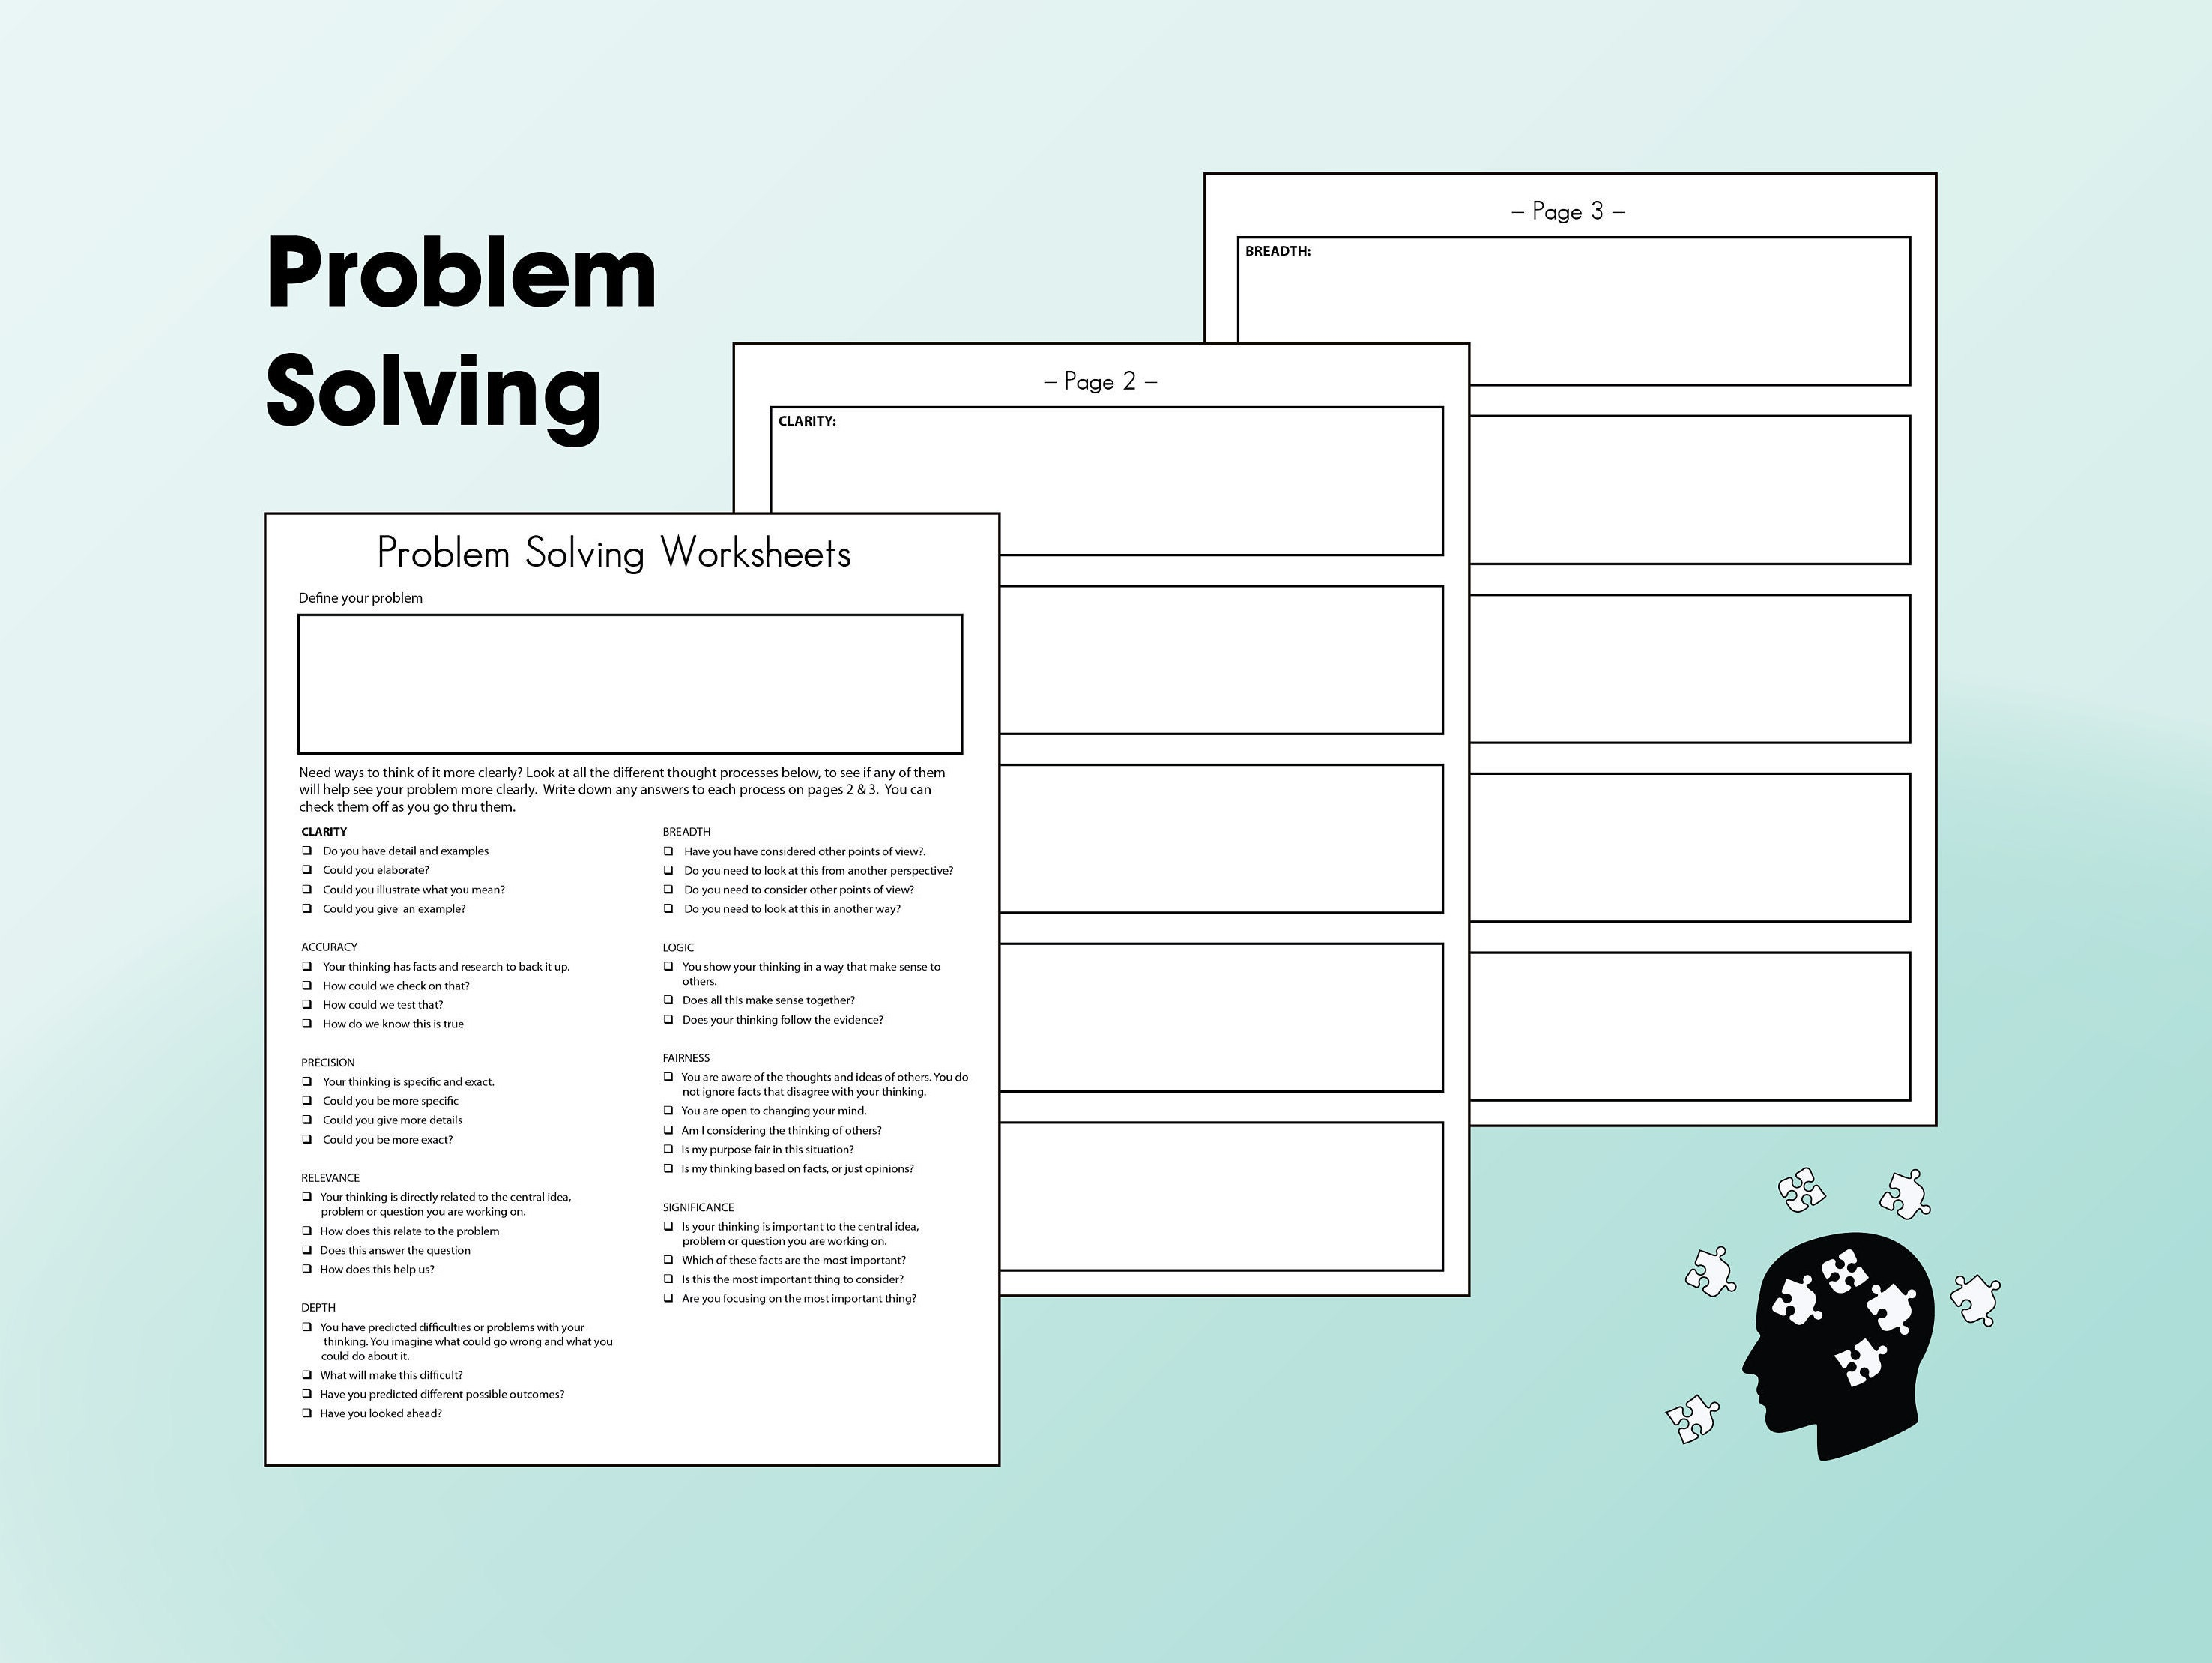 image regarding Printable Stress Test Worksheets named Printable Challenge Resolving and Brainstorming Worksheet for Strain Handle or Workplace